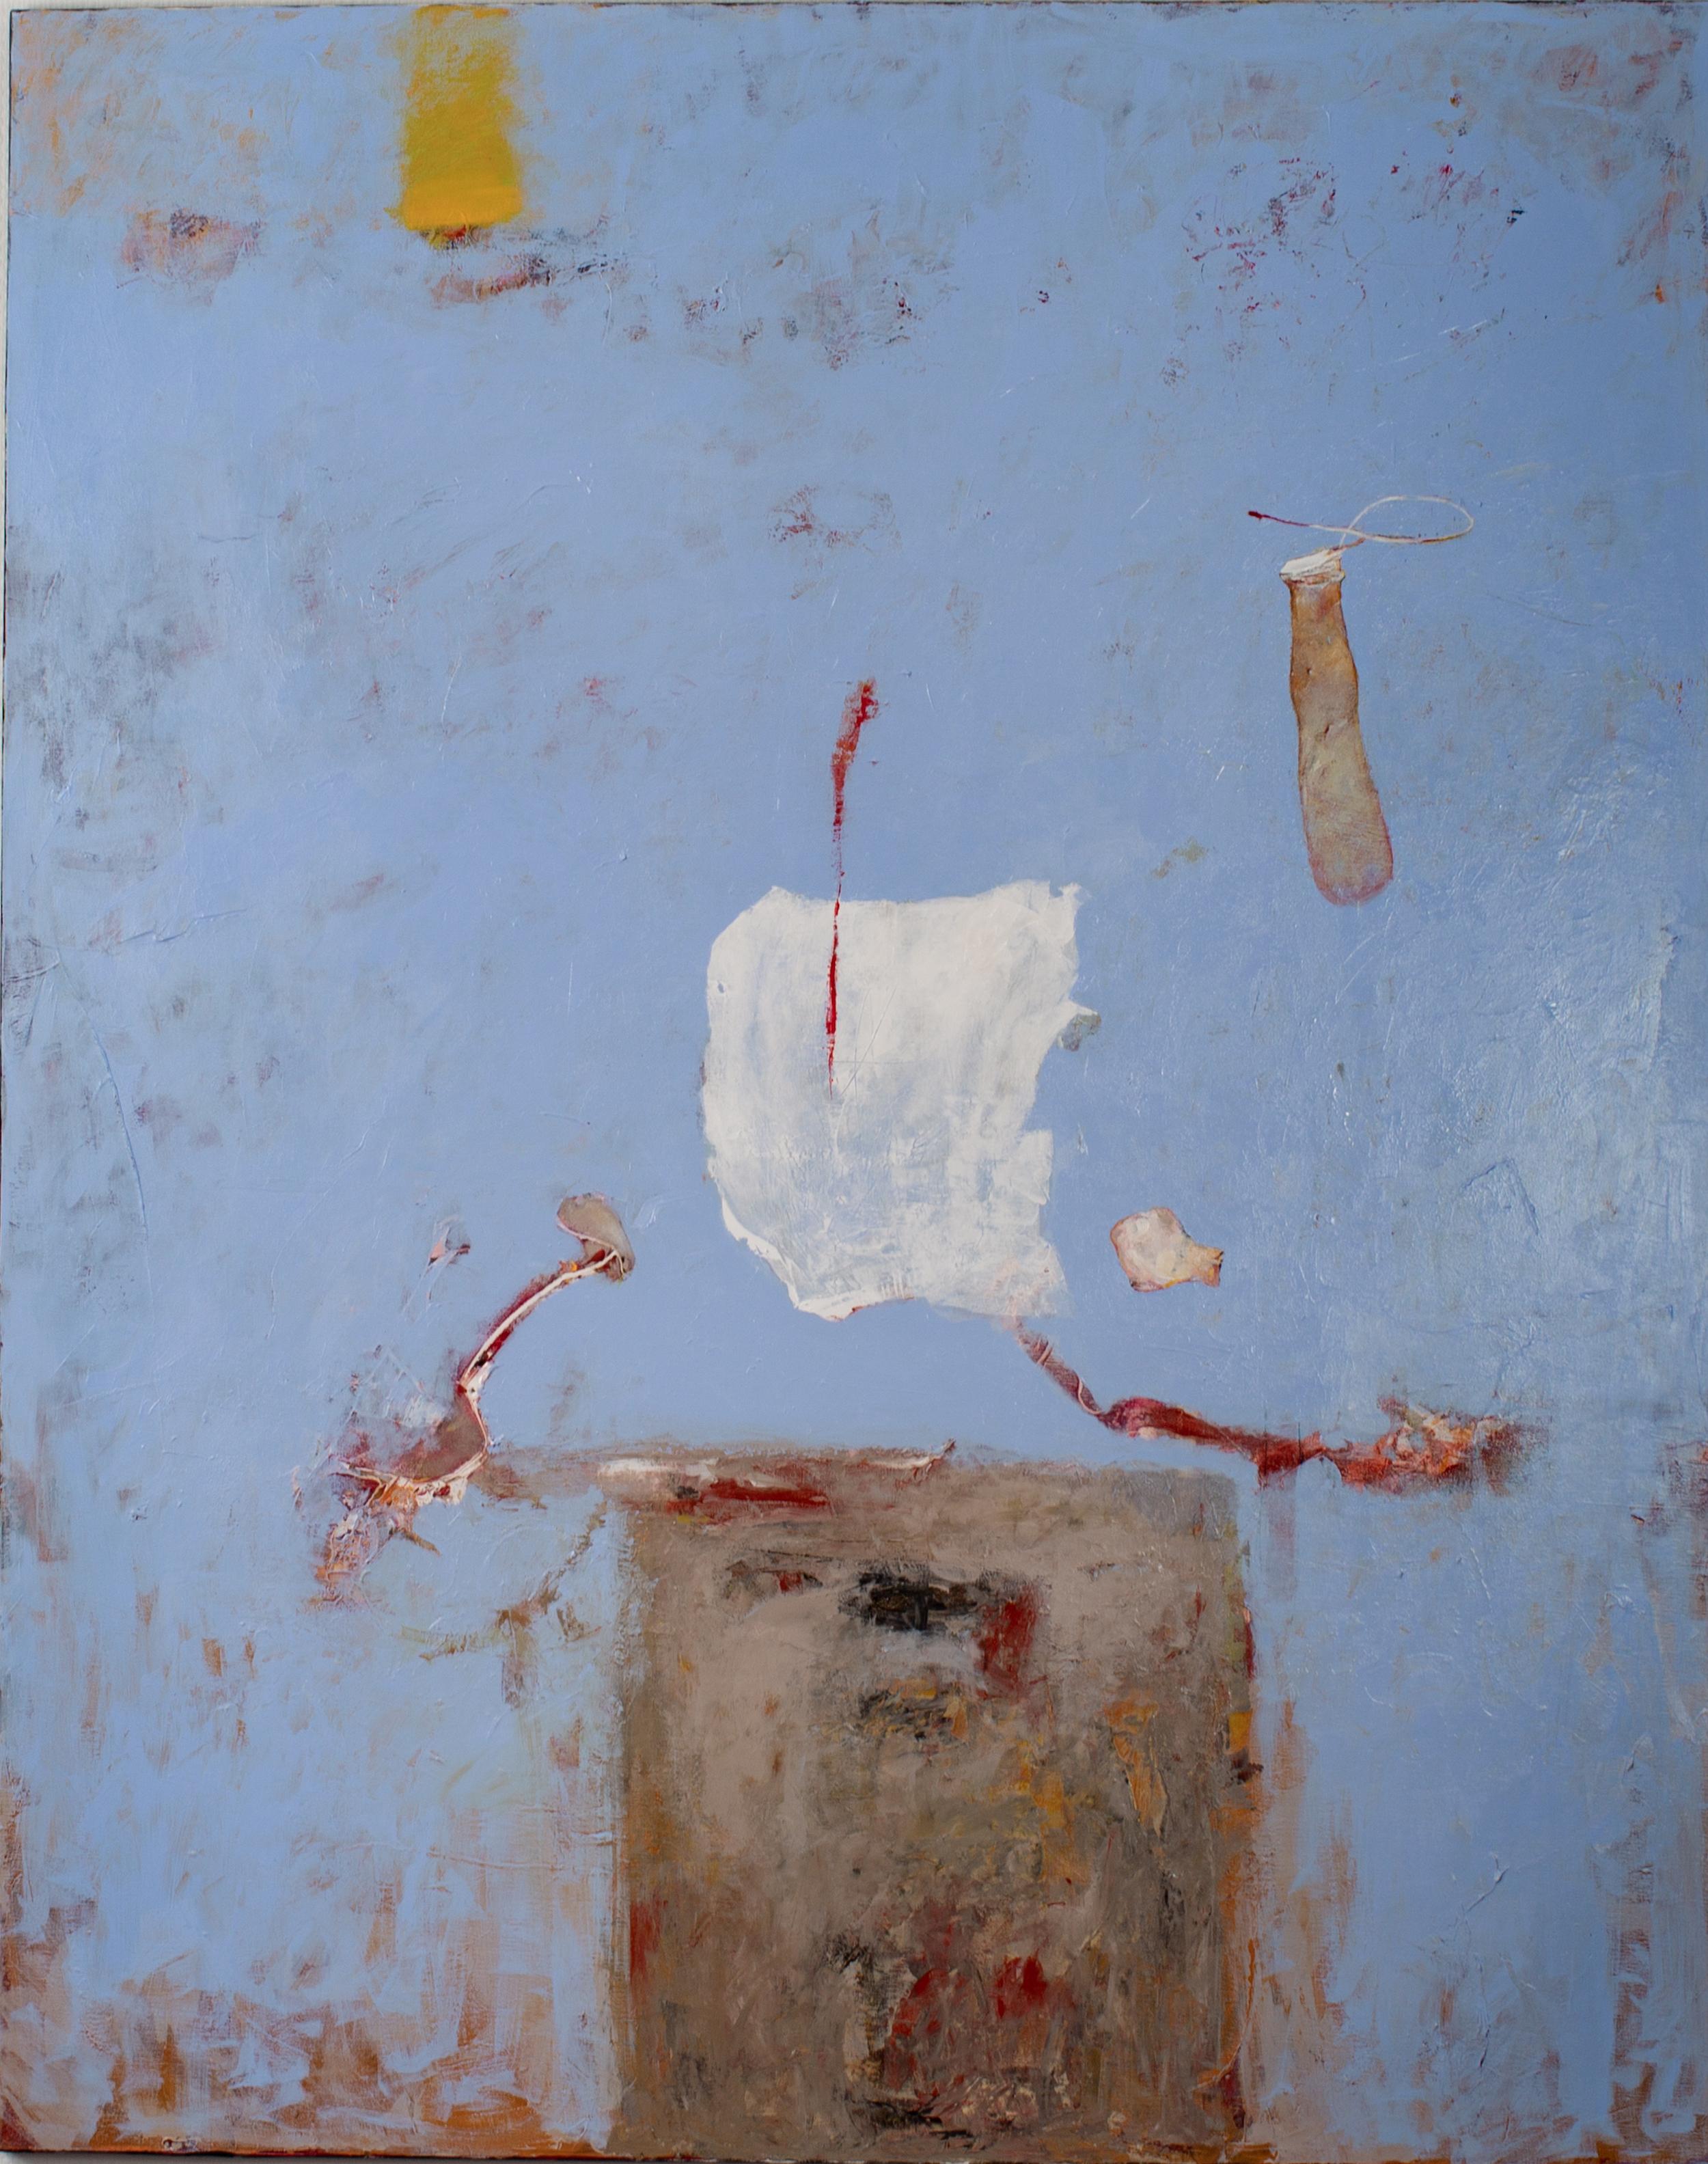 Oleg Bondarenko - Tower and blue skies, oil painting